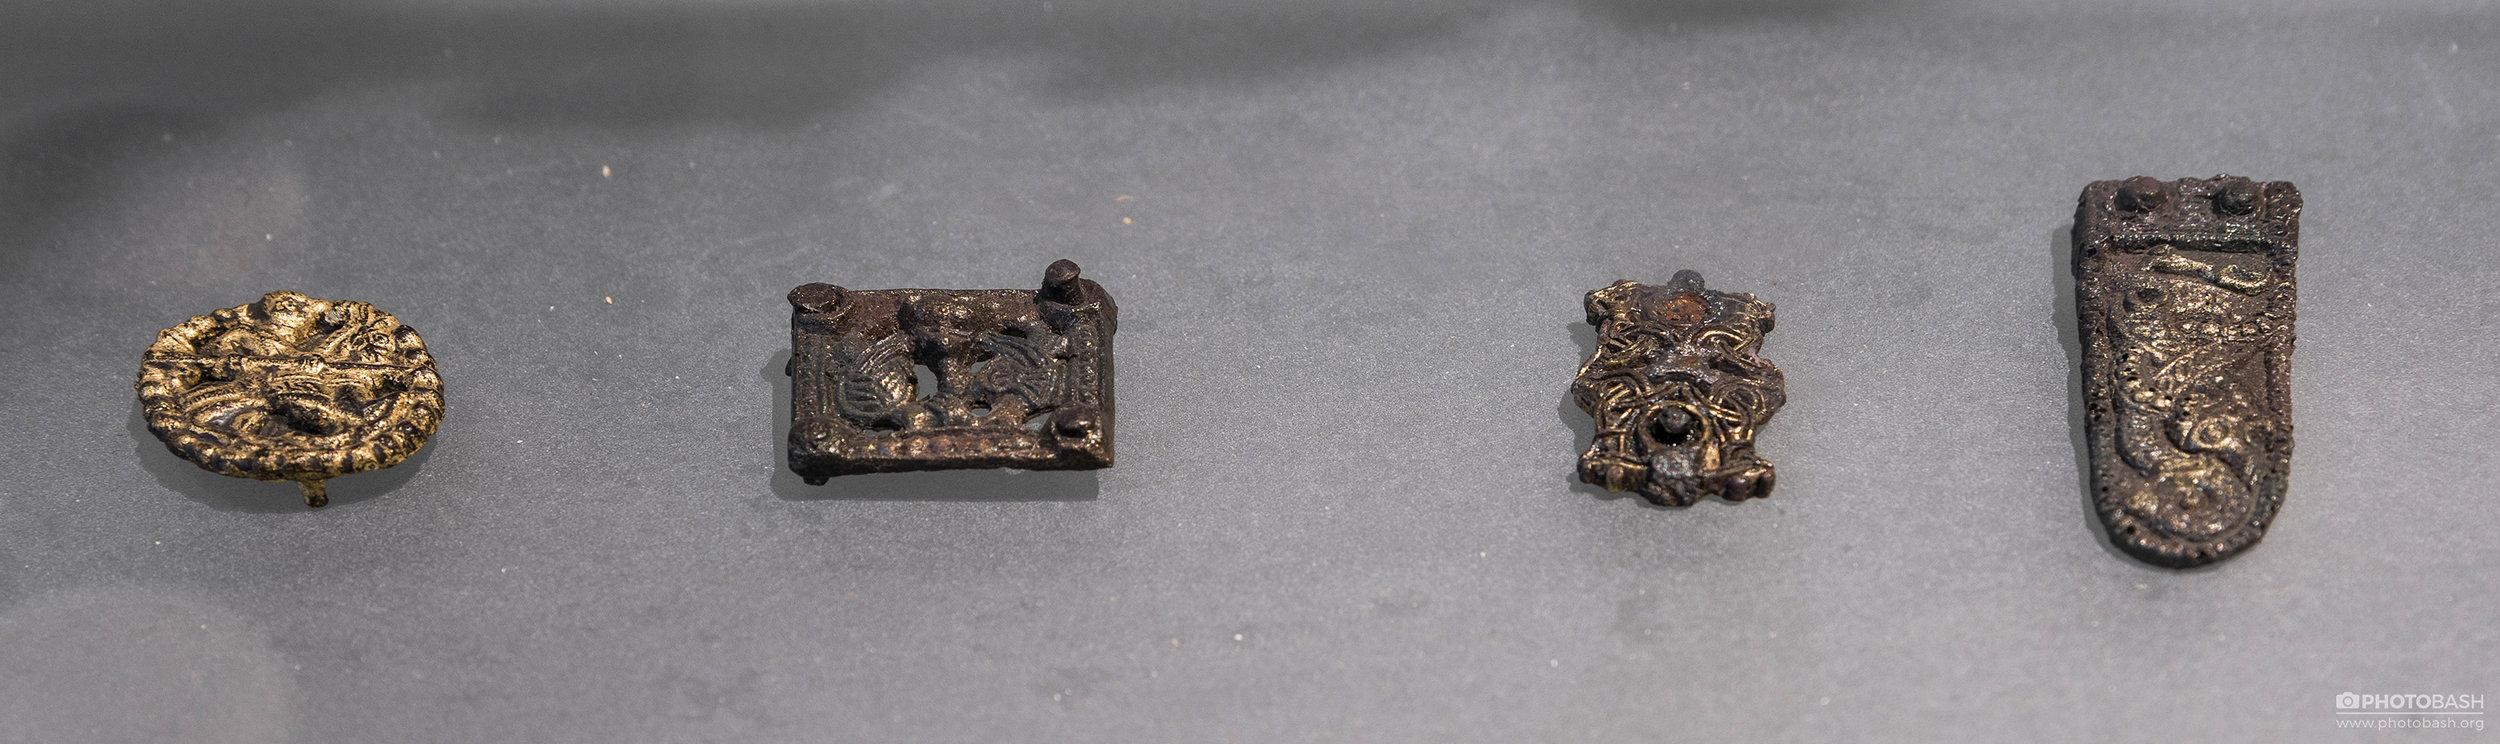 Viking-Artifacts-Ornate-Brooch.jpg